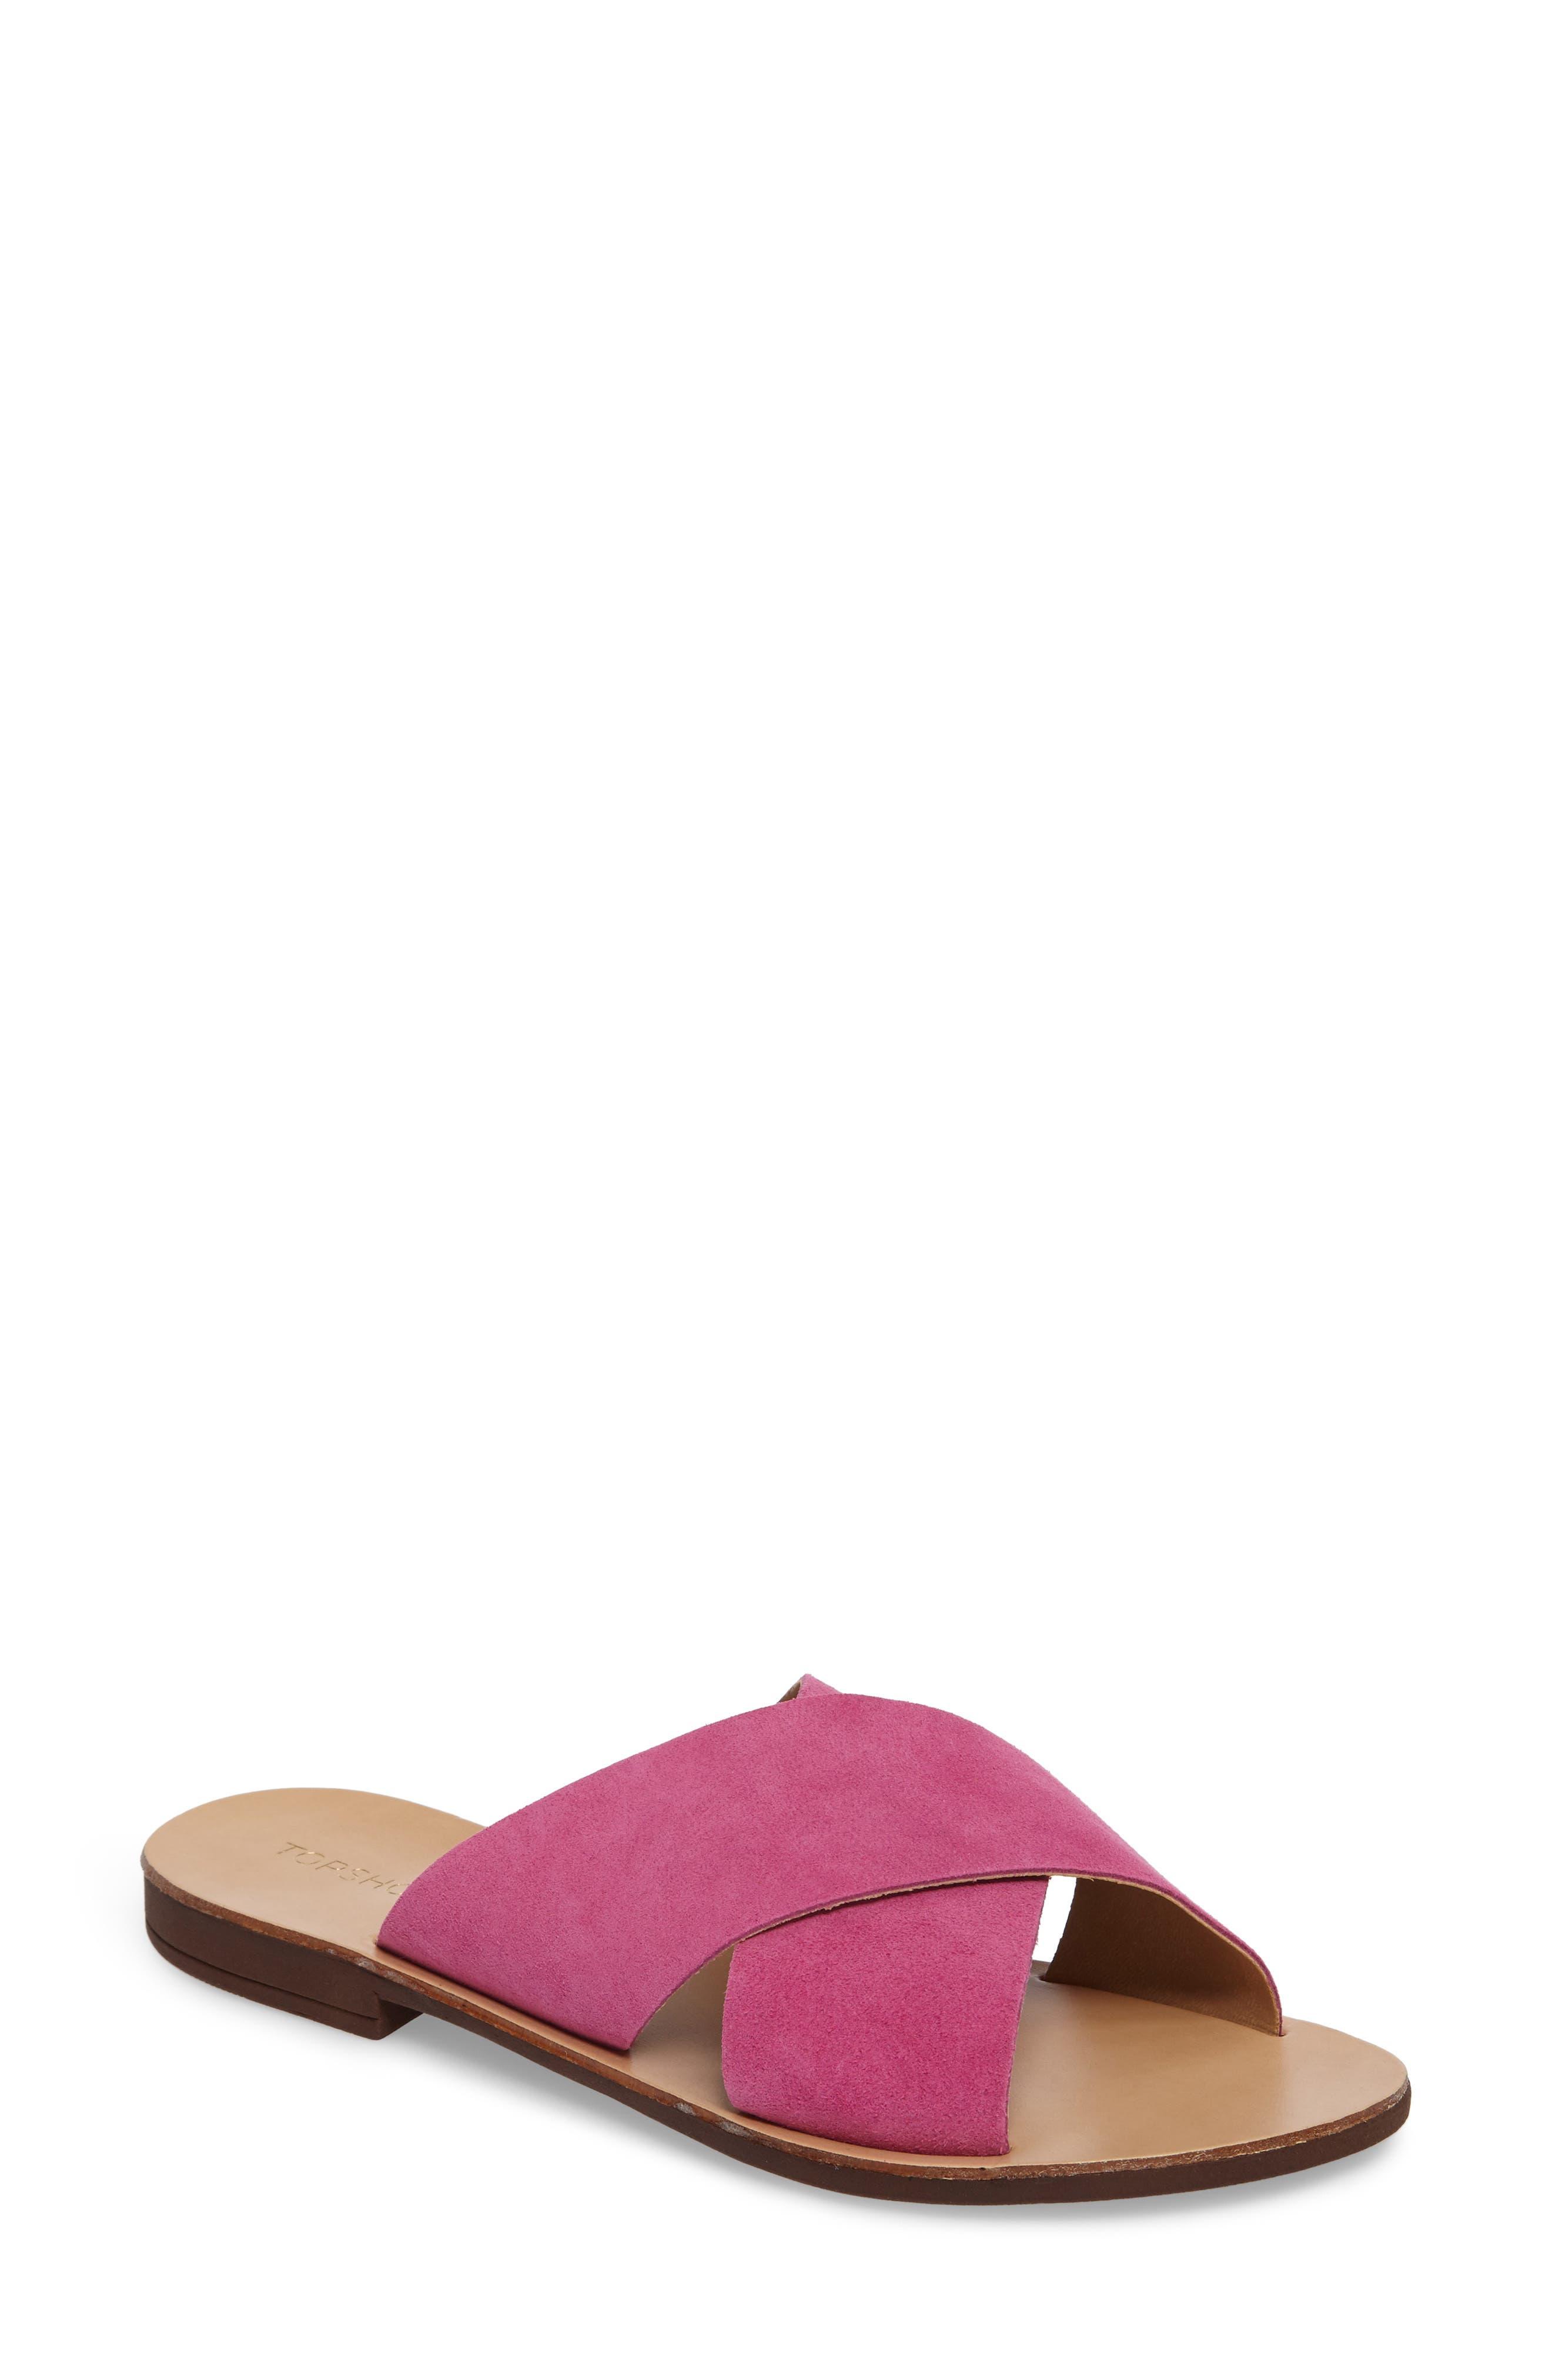 Main Image - Topshop Hawaii Crisscross Sandal (Women)